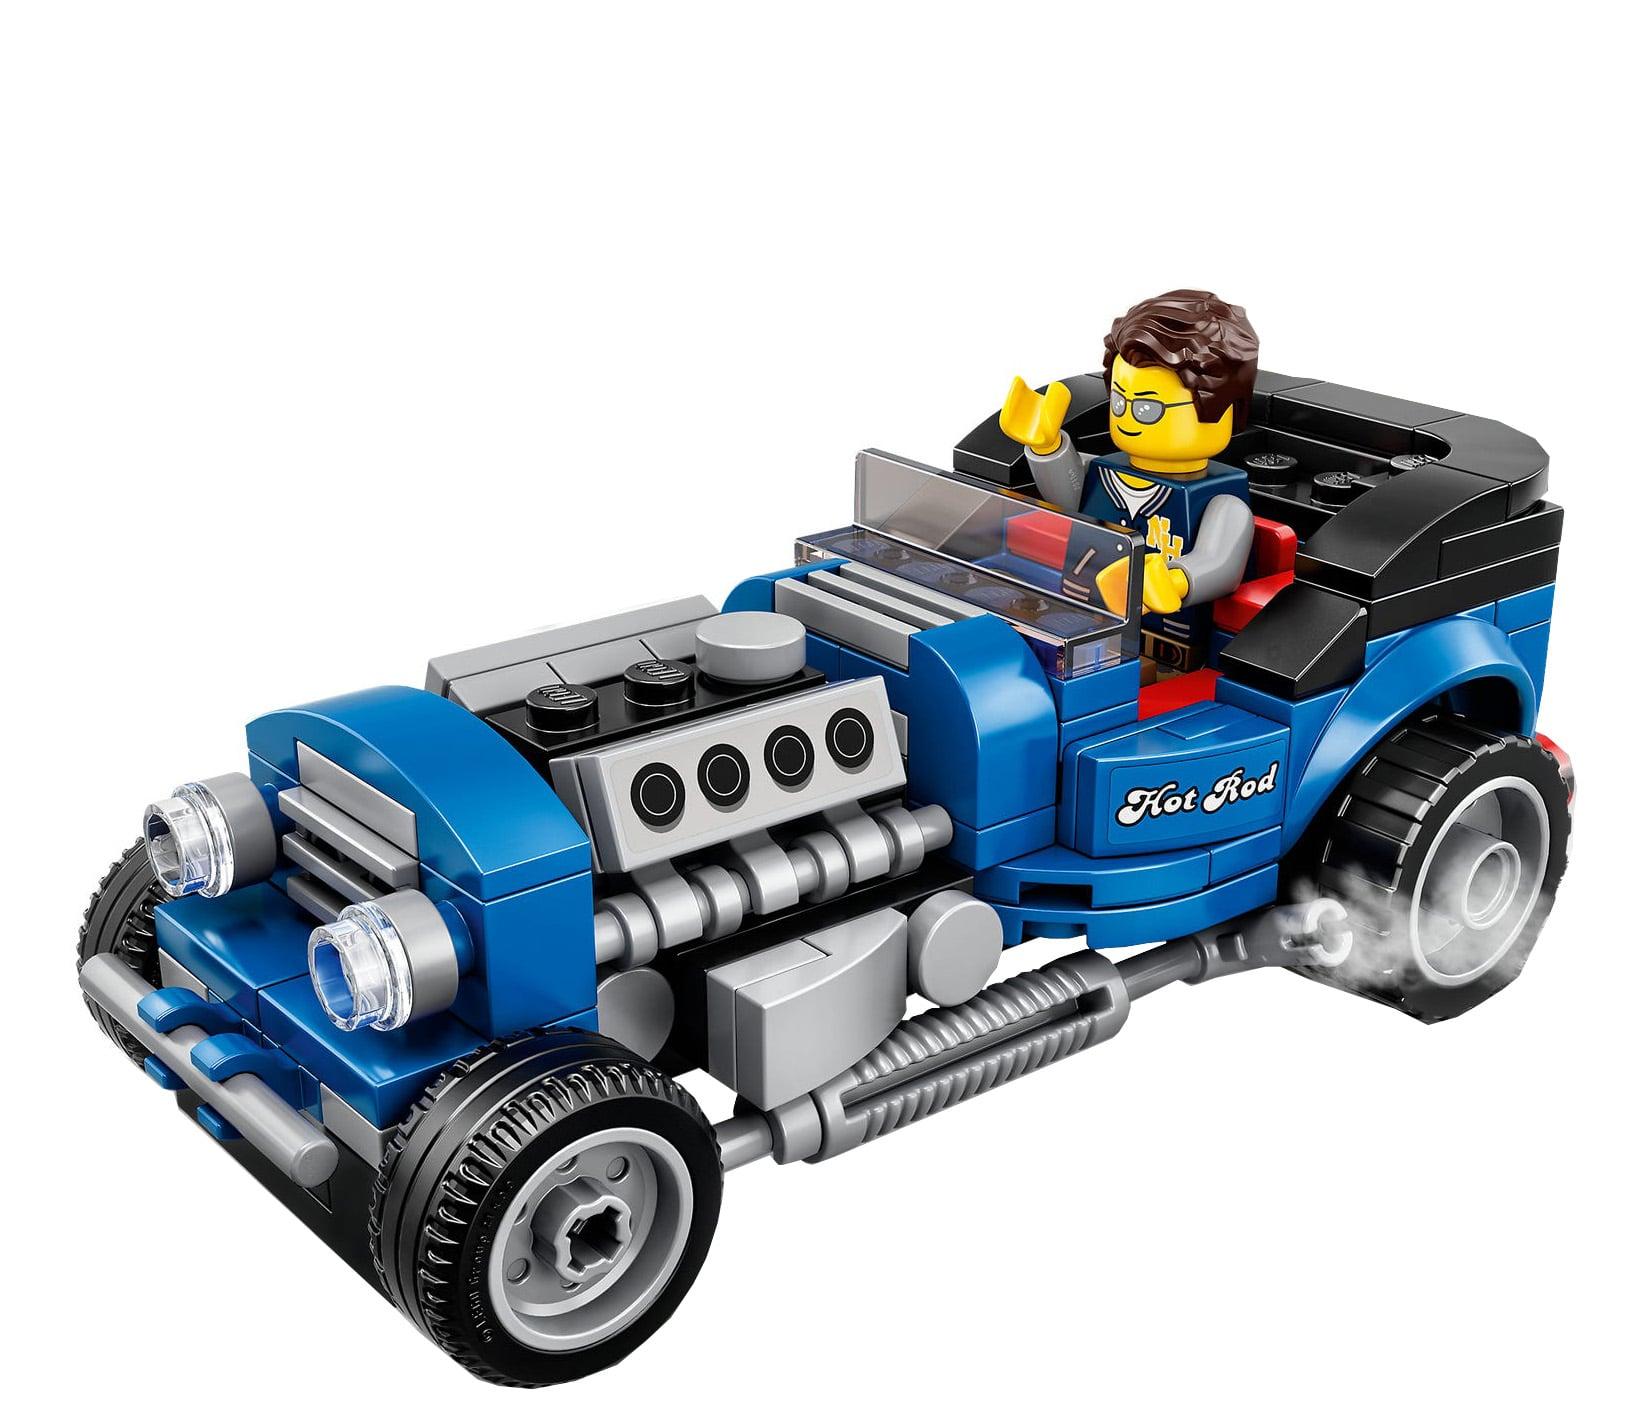 LEGO 40409 Hot Rod Vergleich